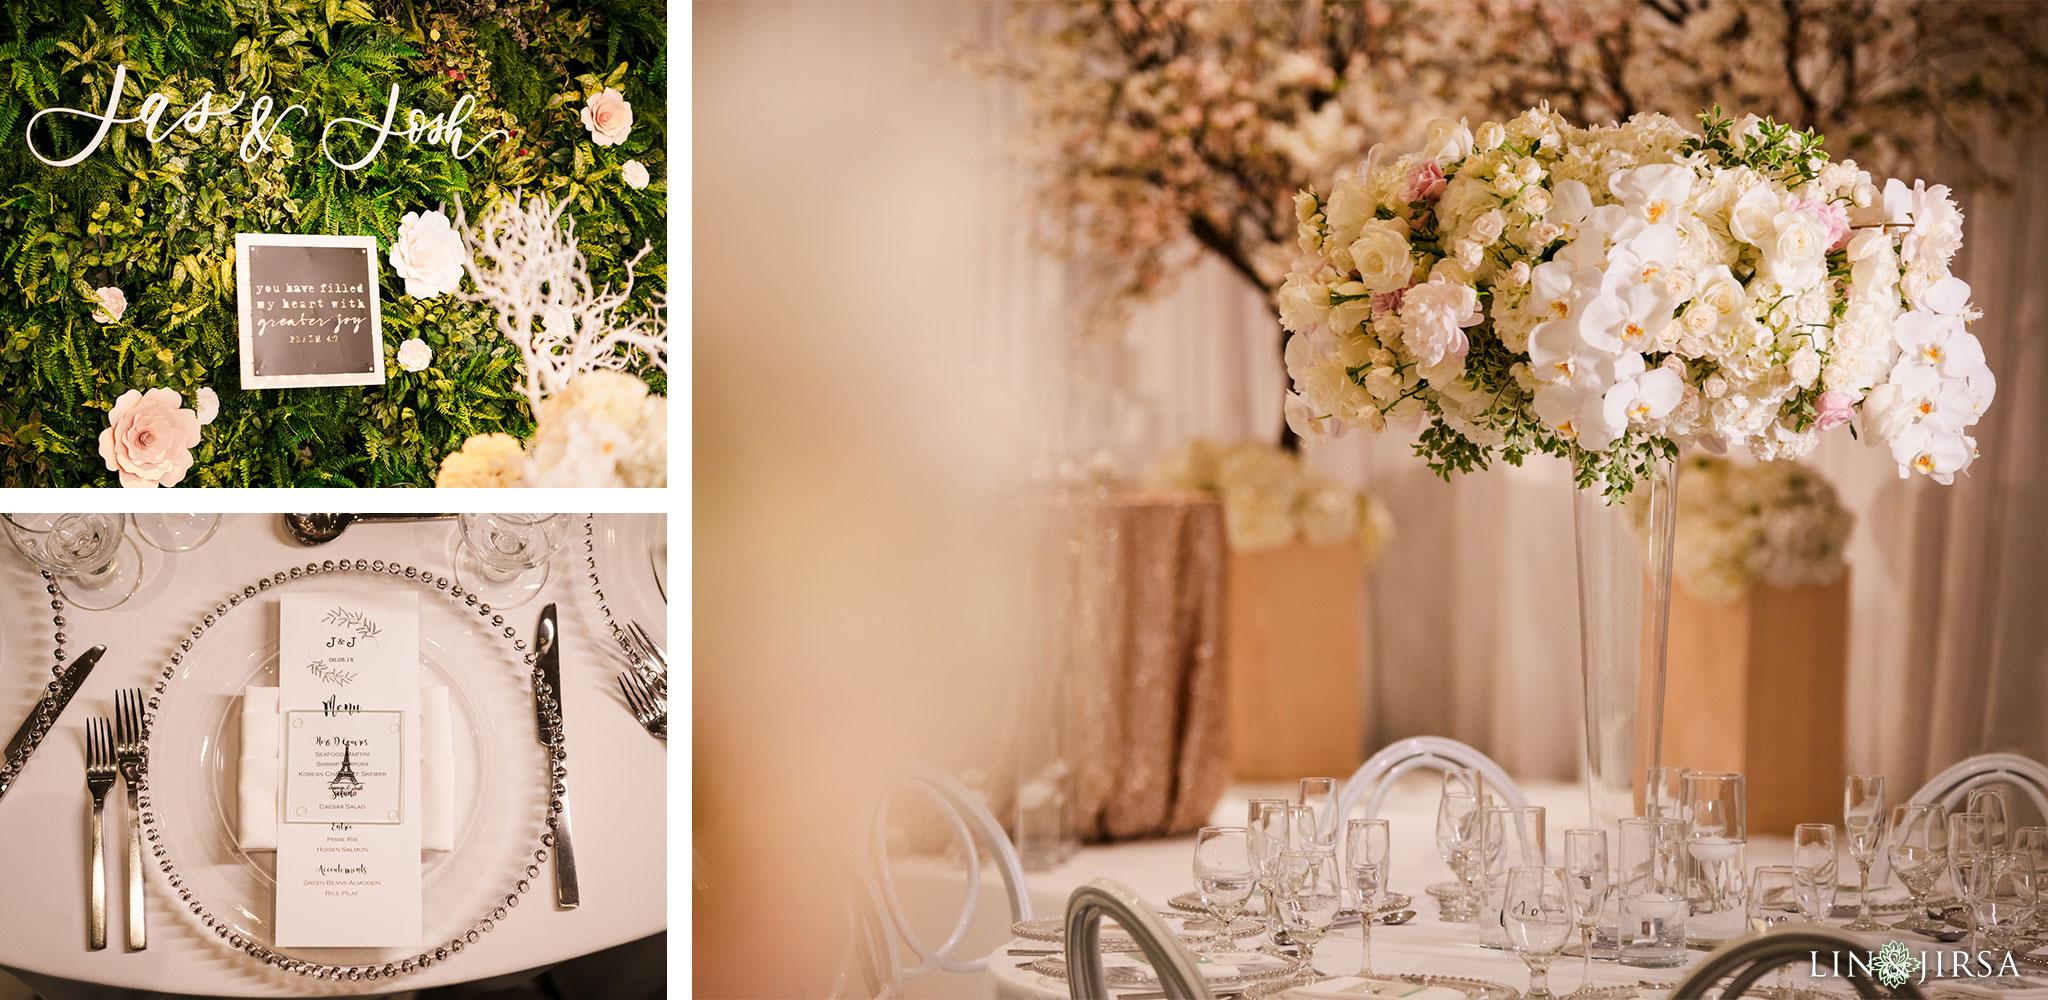 14 venue by three petals huntington beach wedding photography